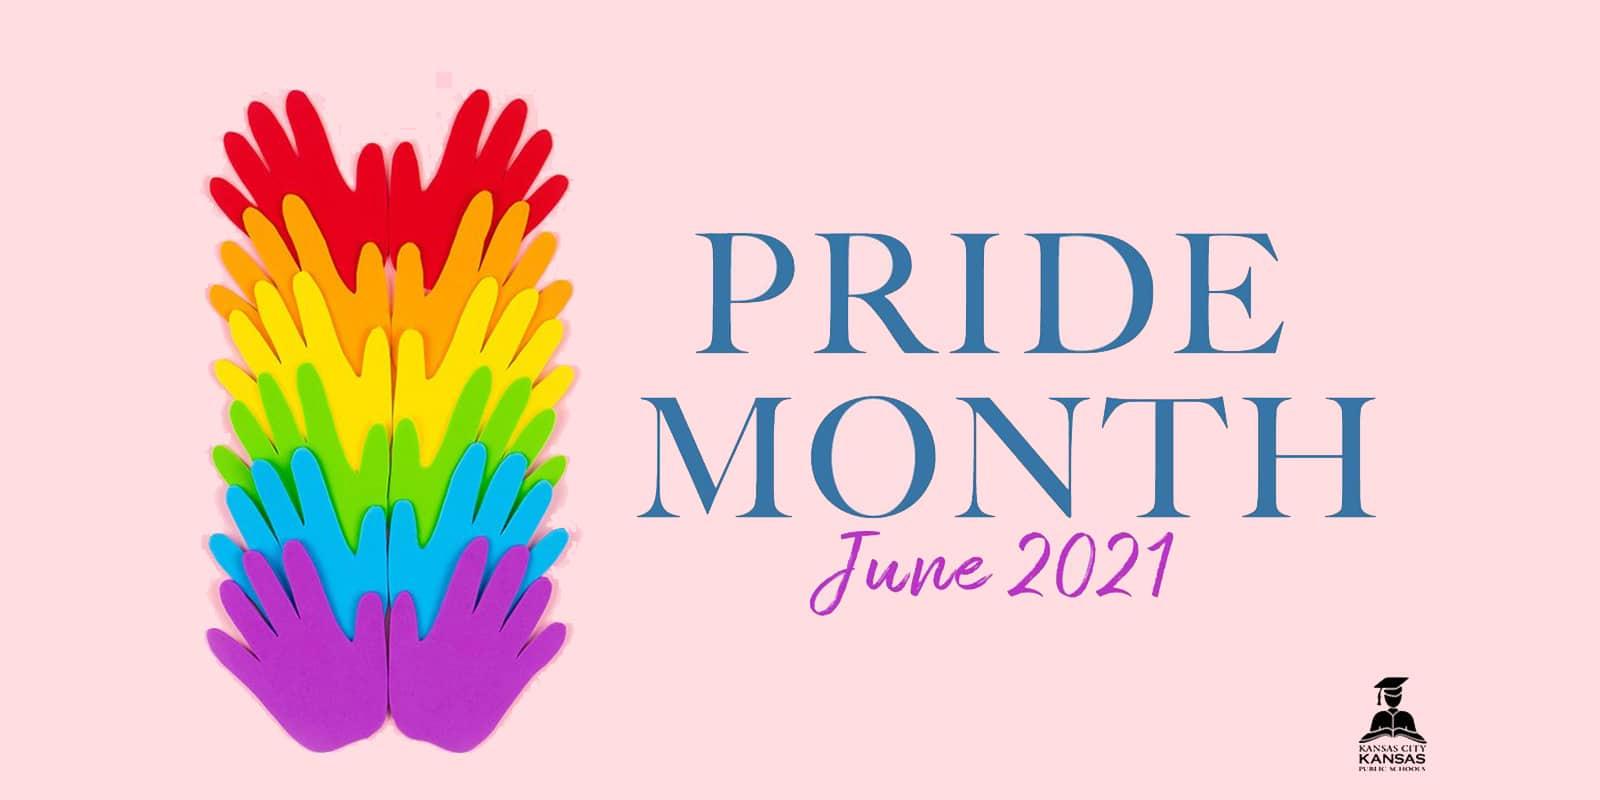 Pride Month - June 2021